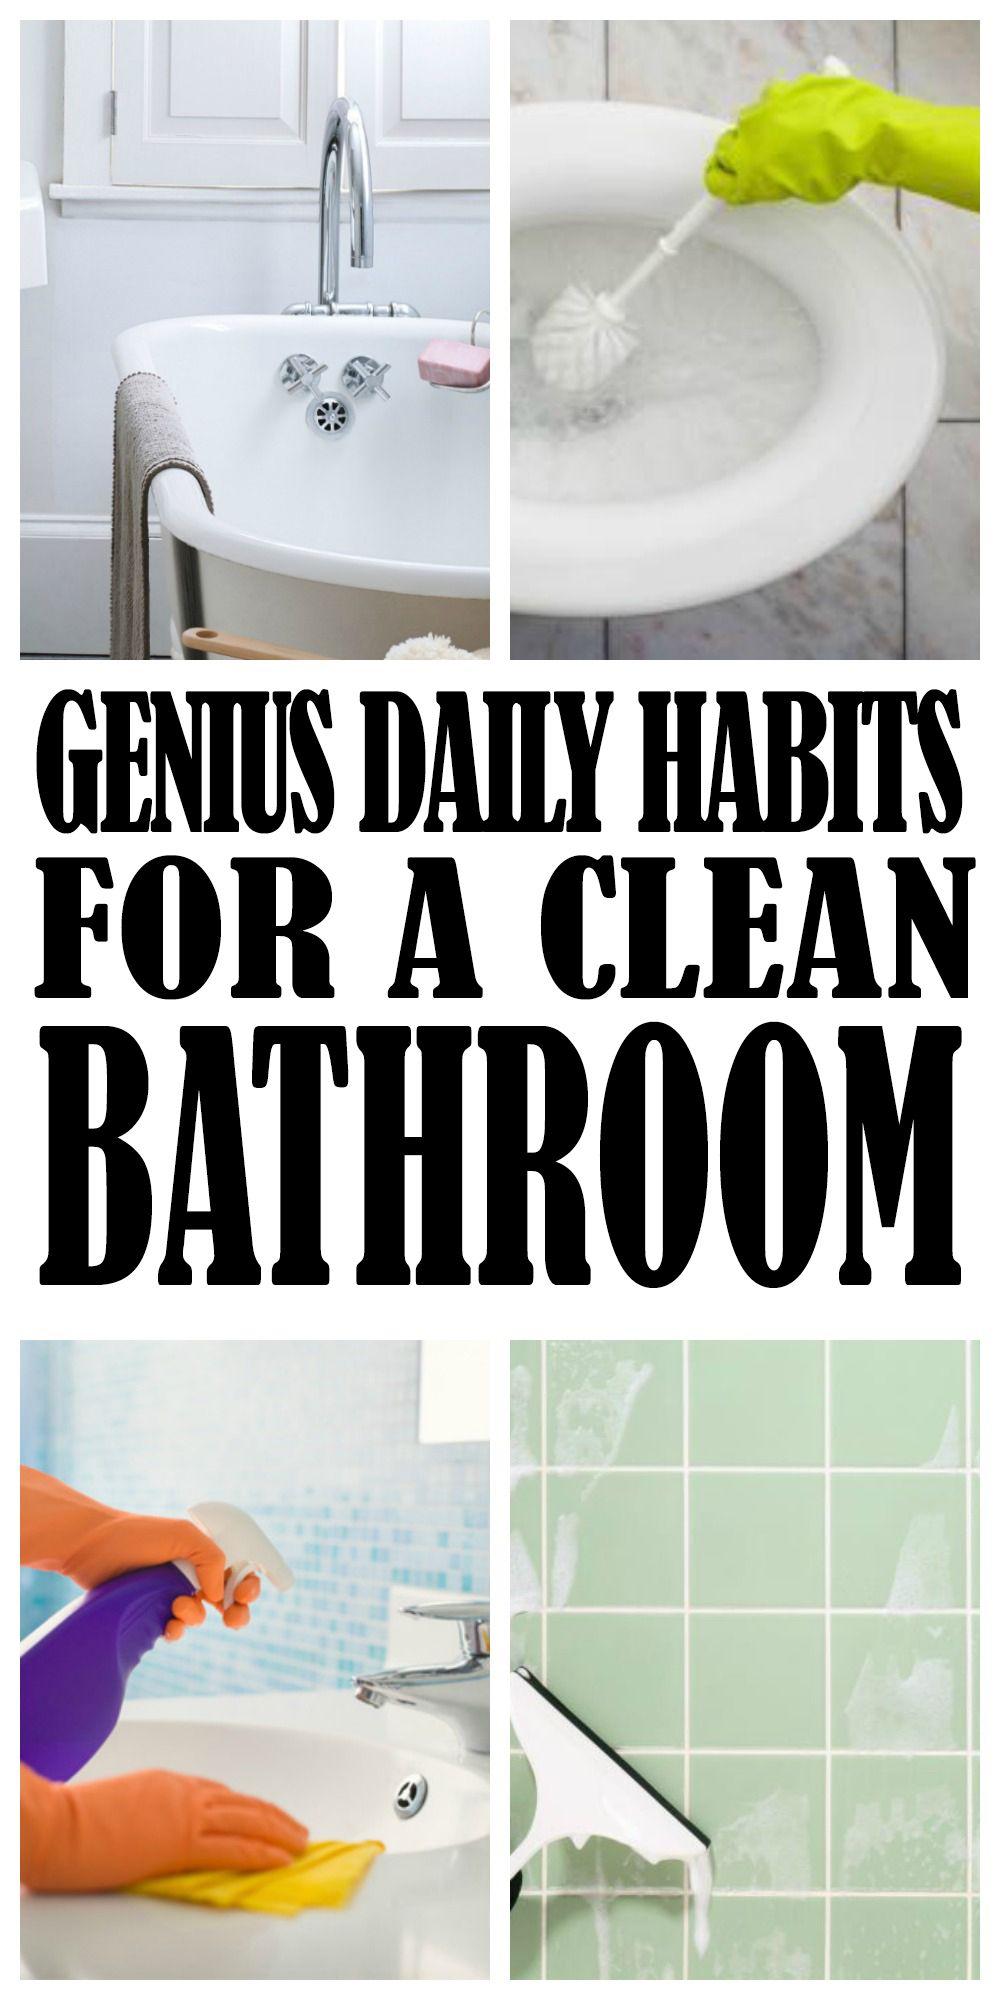 Genius Daily Habits For A Clean Bathroom Always Cleaning Bathroom Cleaning House Cleaning Tips